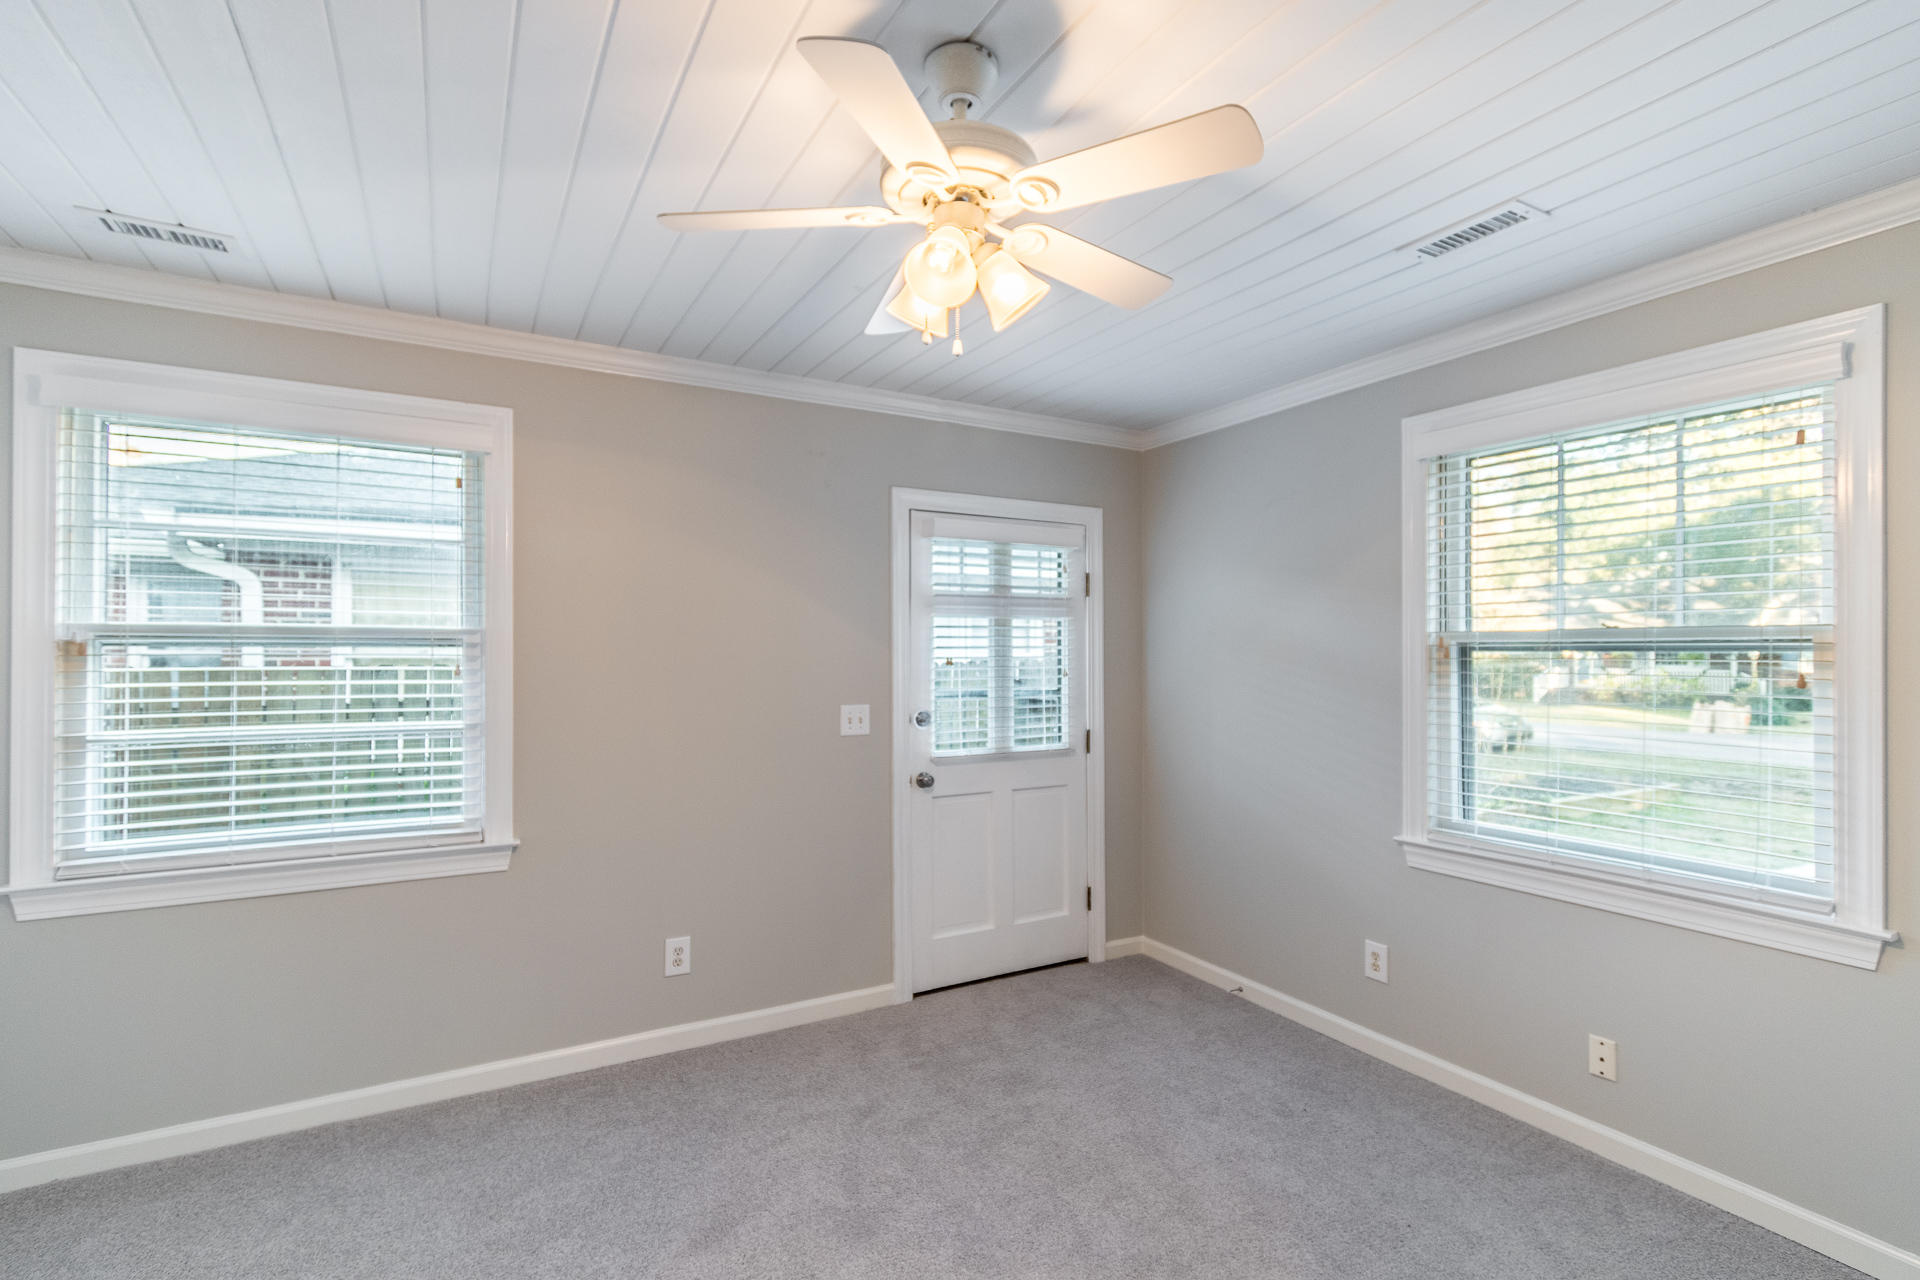 Edgewood Gardens Homes For Sale - 507 Risher, Charleston, SC - 9